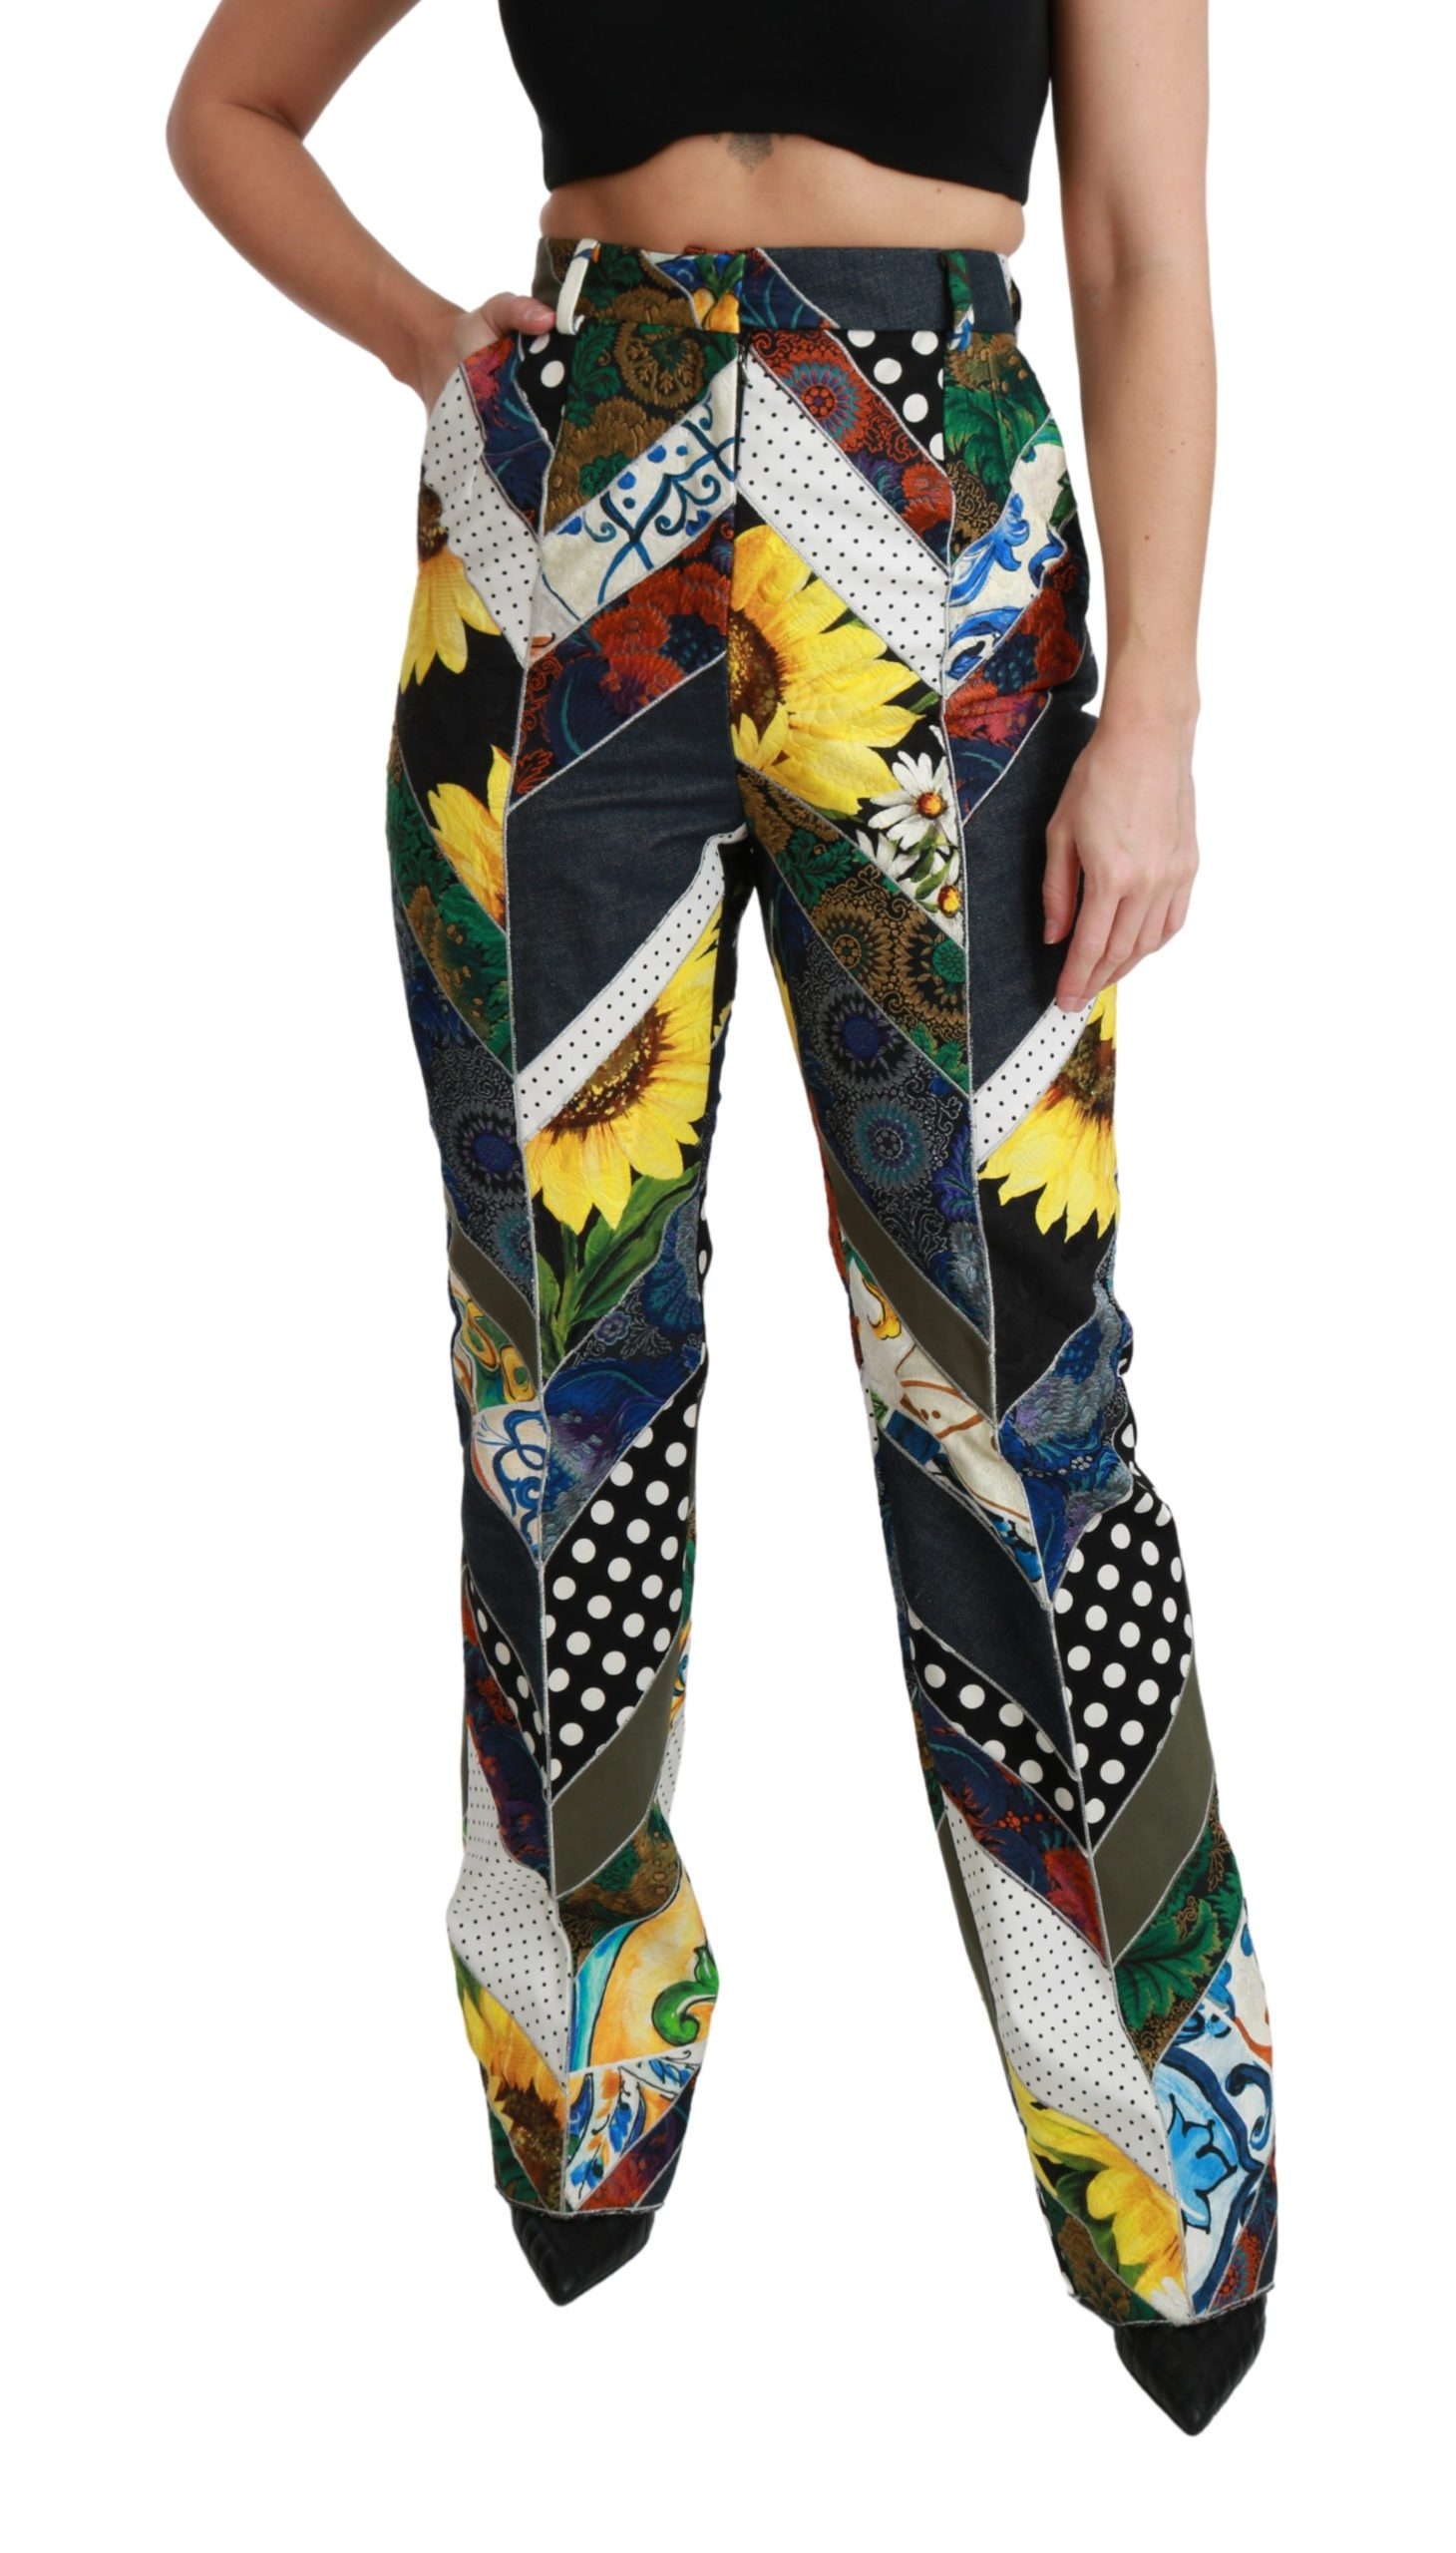 Dolce & Gabbana Women's Print High Waist Straight Trouser Multicolor PAN70936 - IT40|S